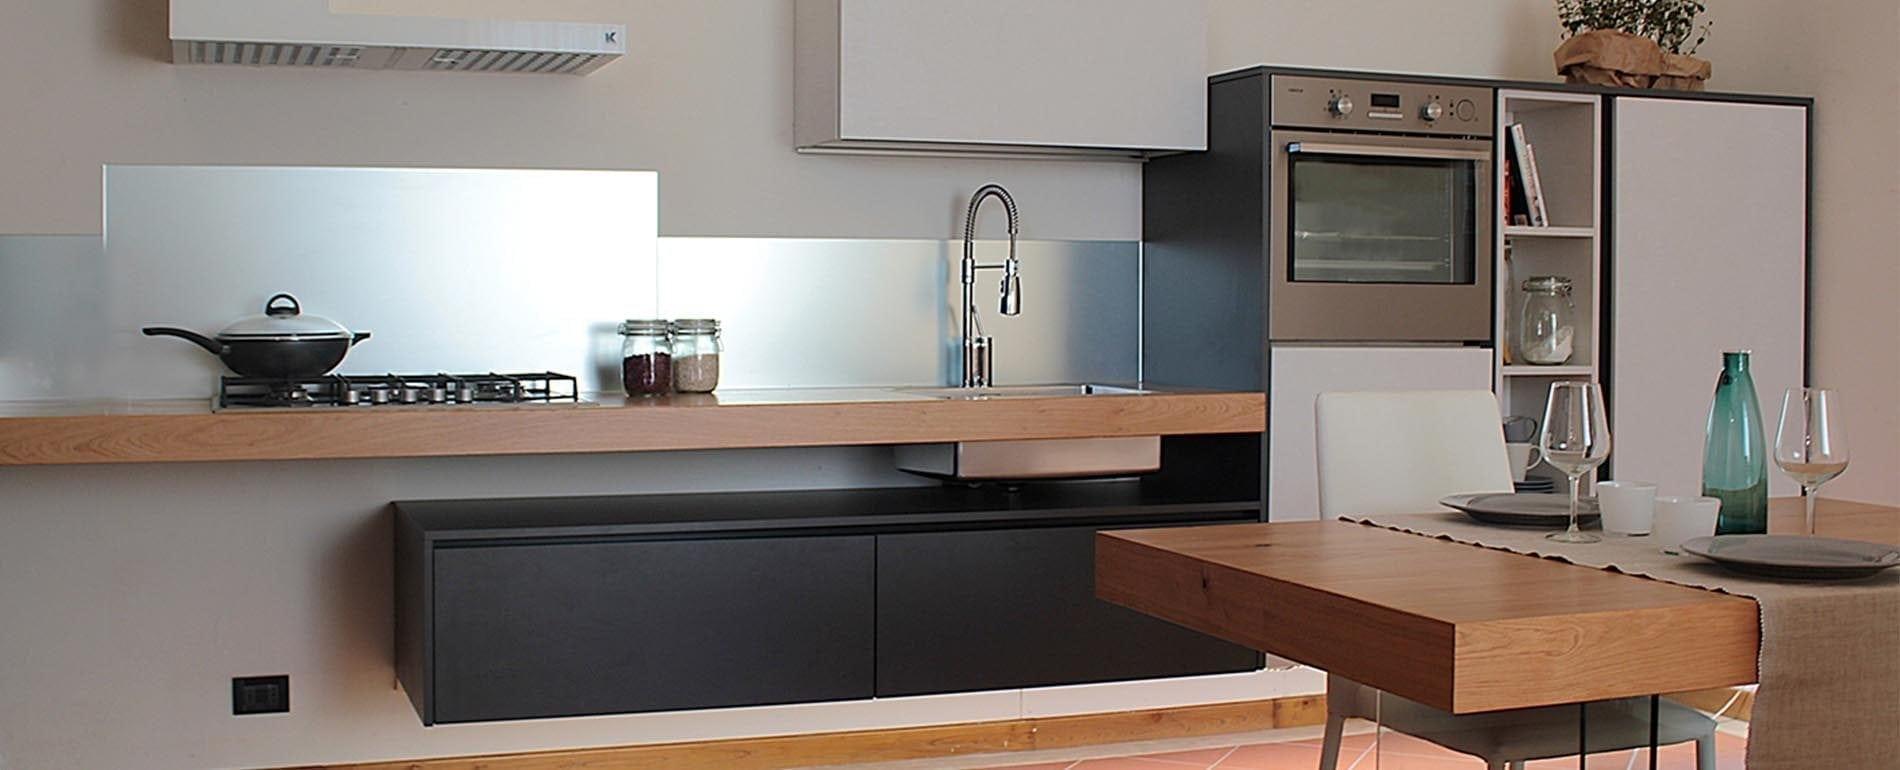 Pg arredamenti centro cucine lucca e firenze for Arredamenti e cucine